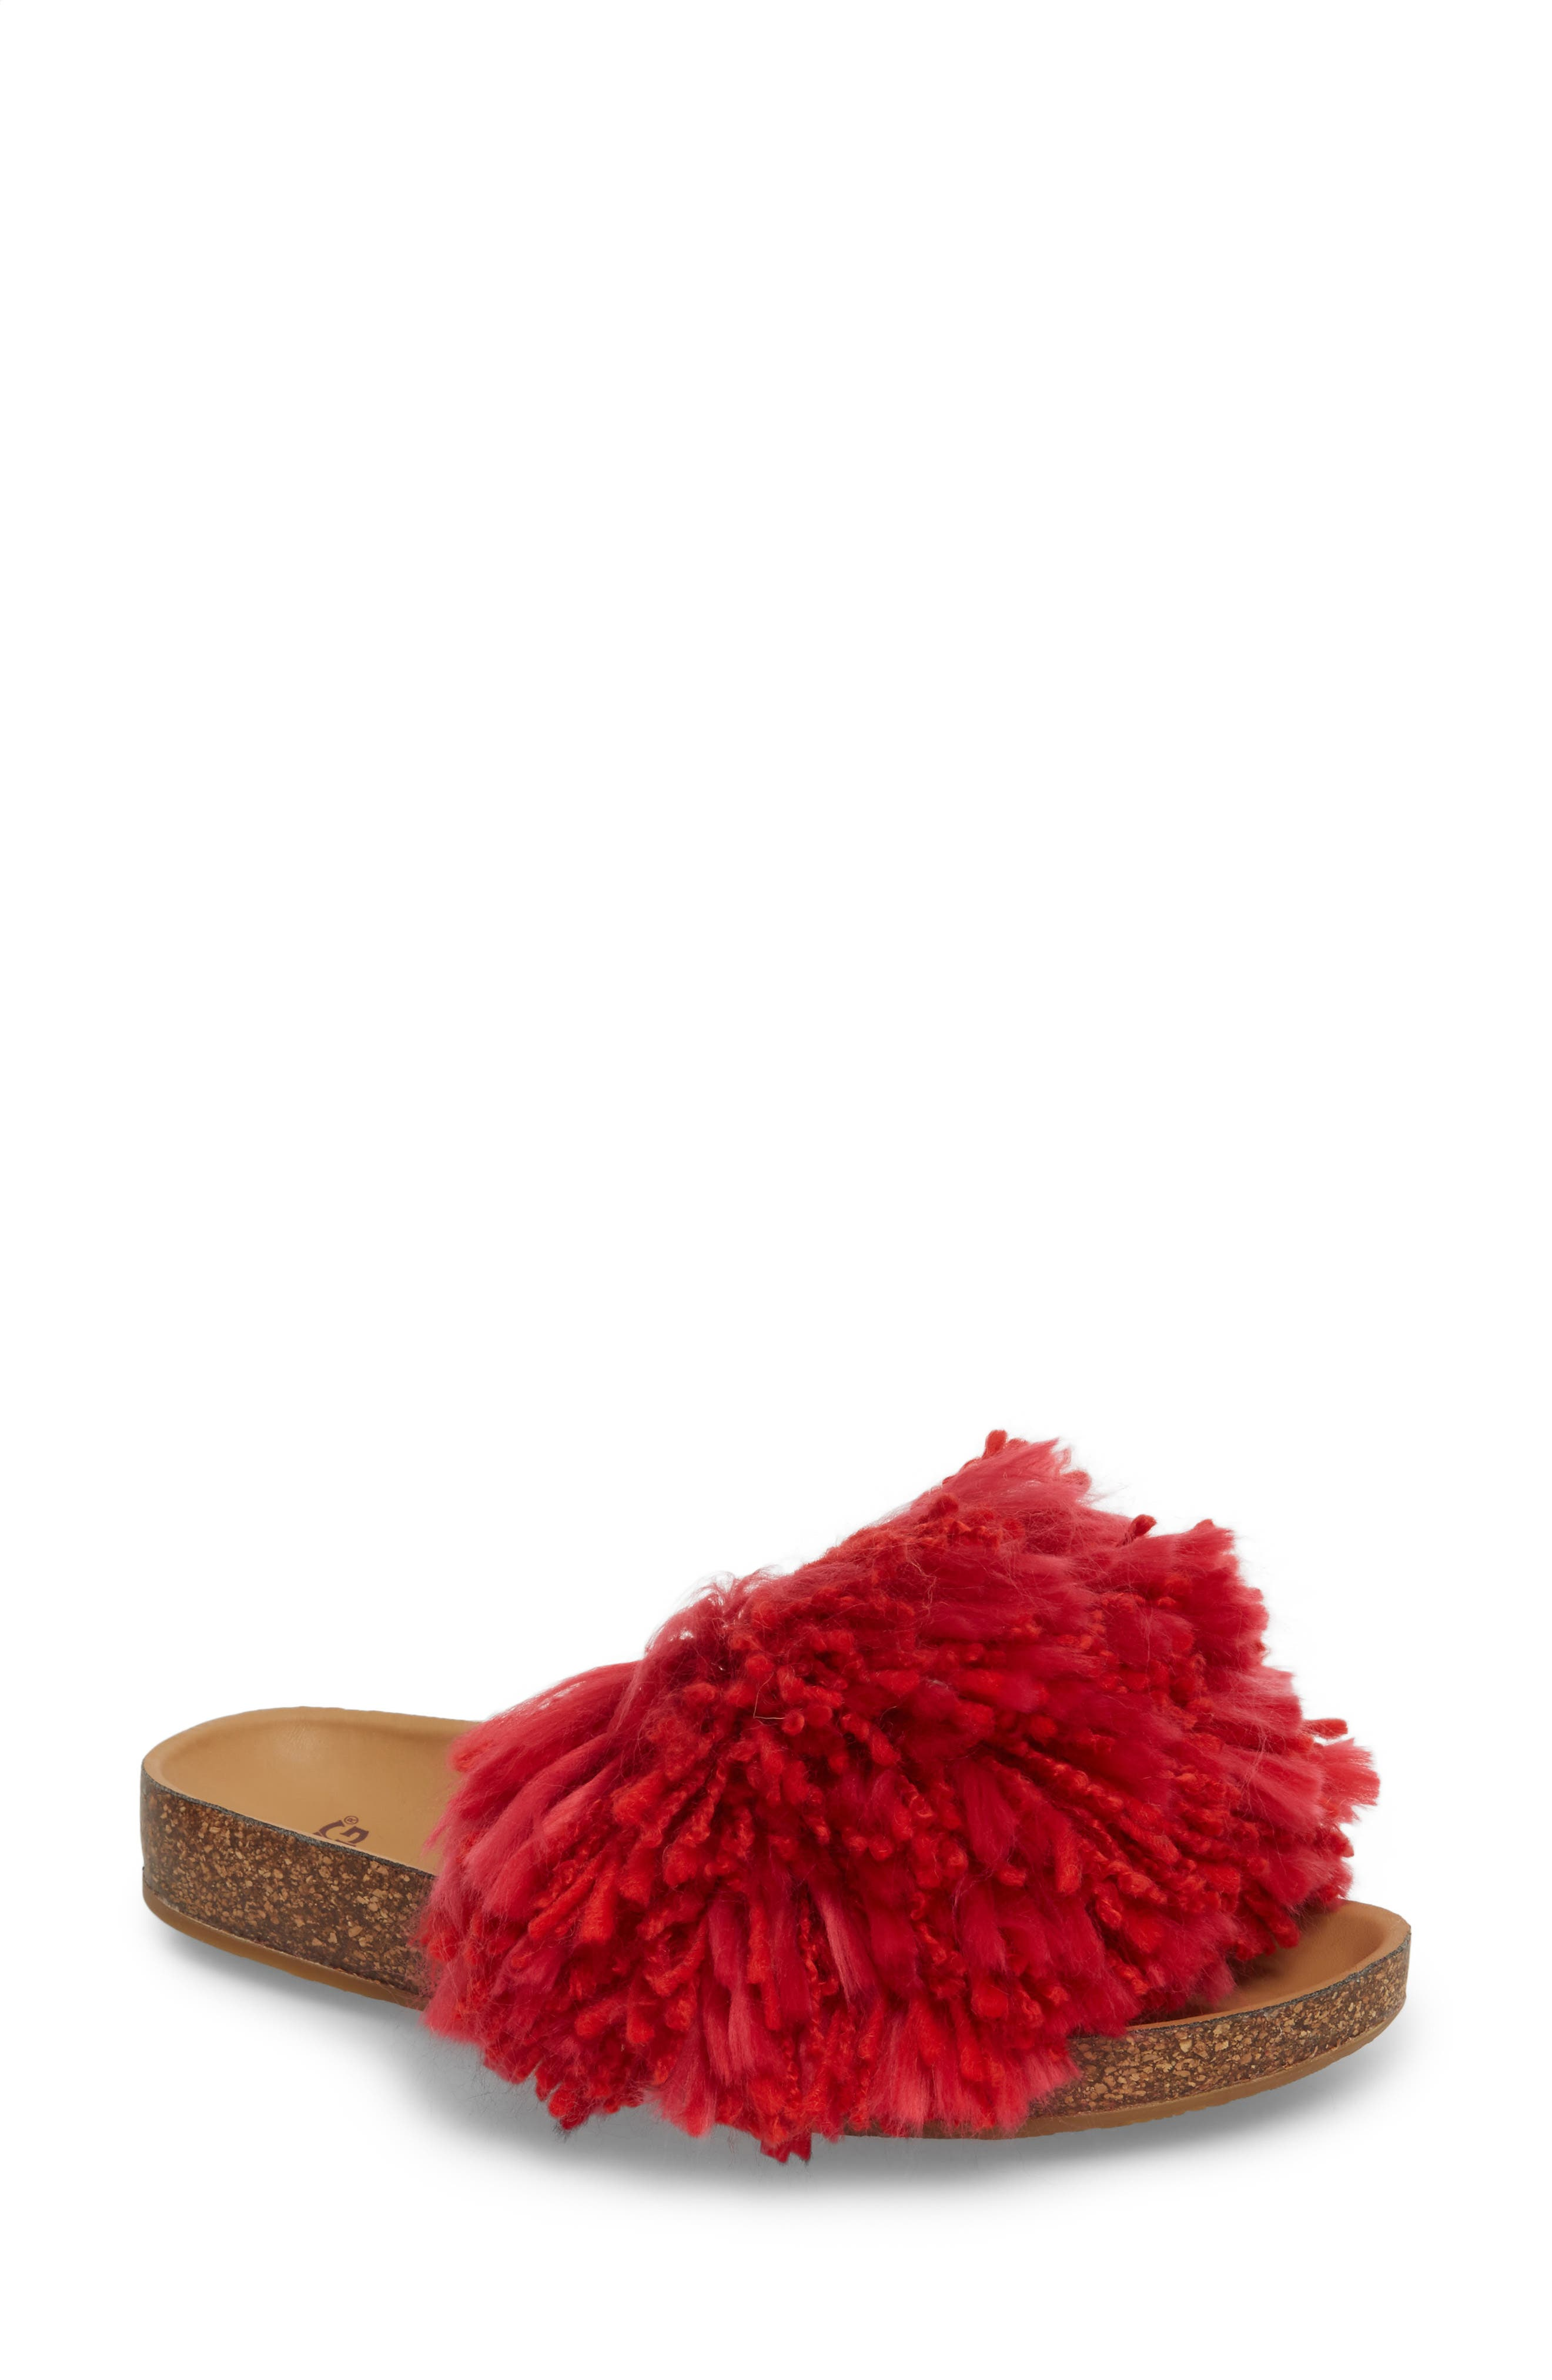 Ugg Cindi Yarn Pom Sandal, Red